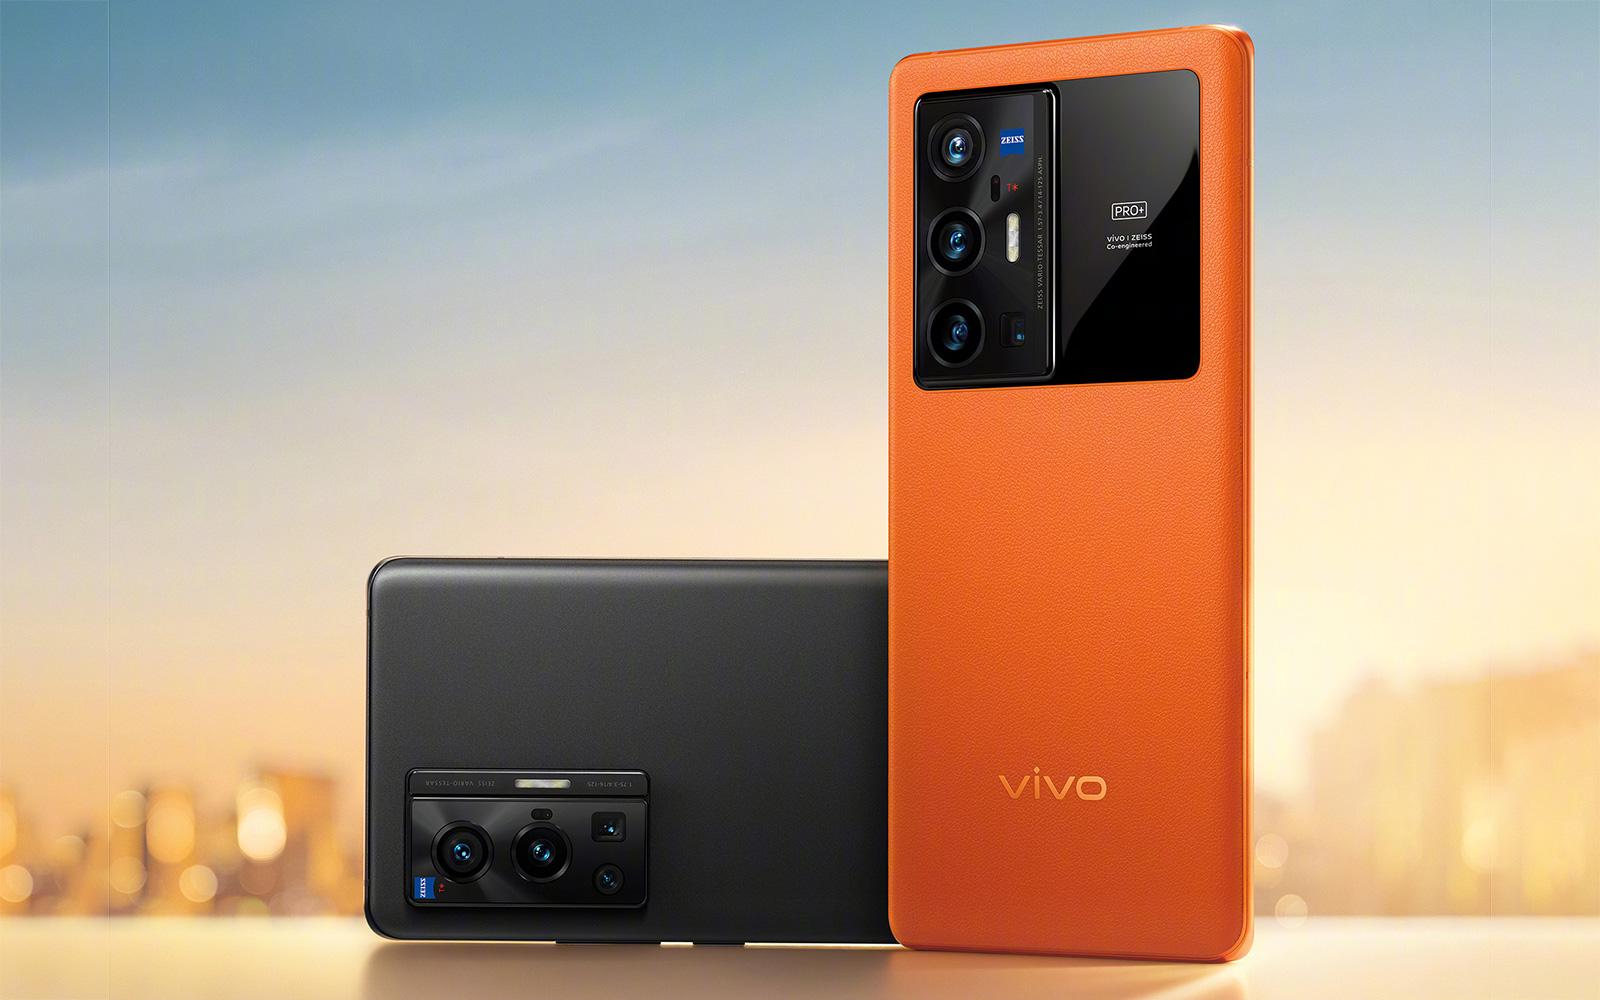 Vivo X70 Pro and X70 Pro Plus